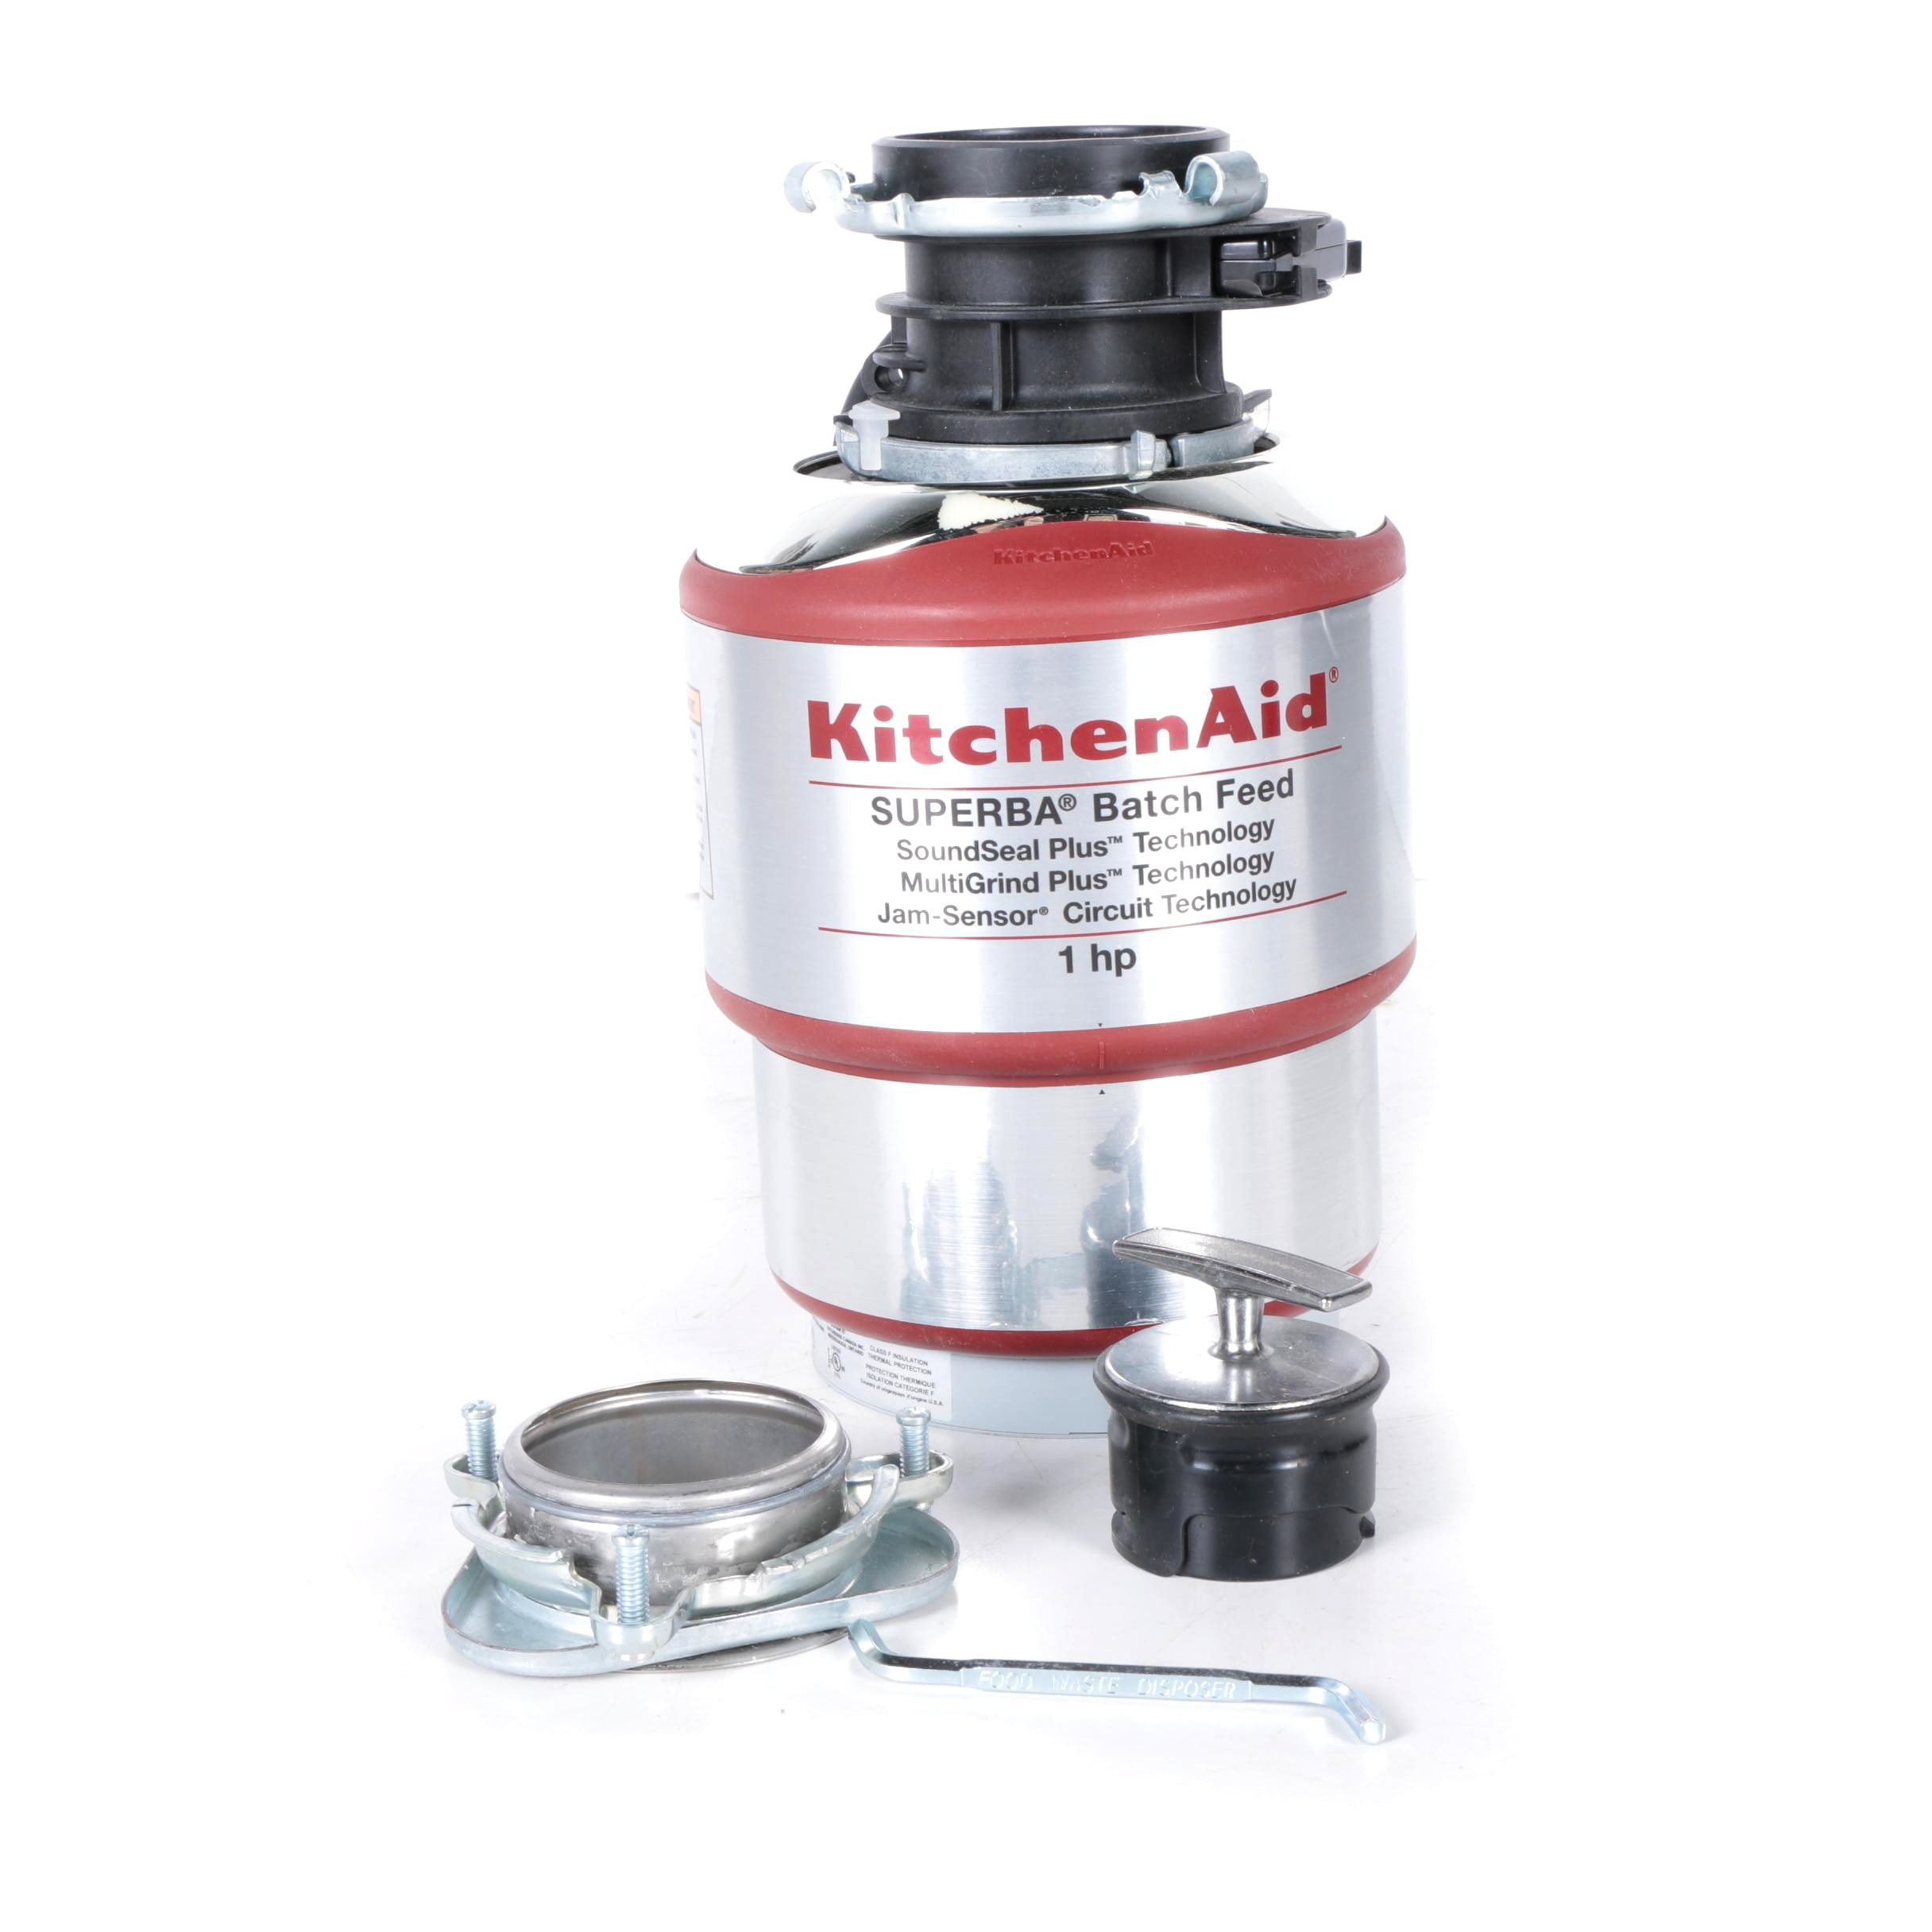 KitchenAid 1HP Batch Feed Waste Disposer